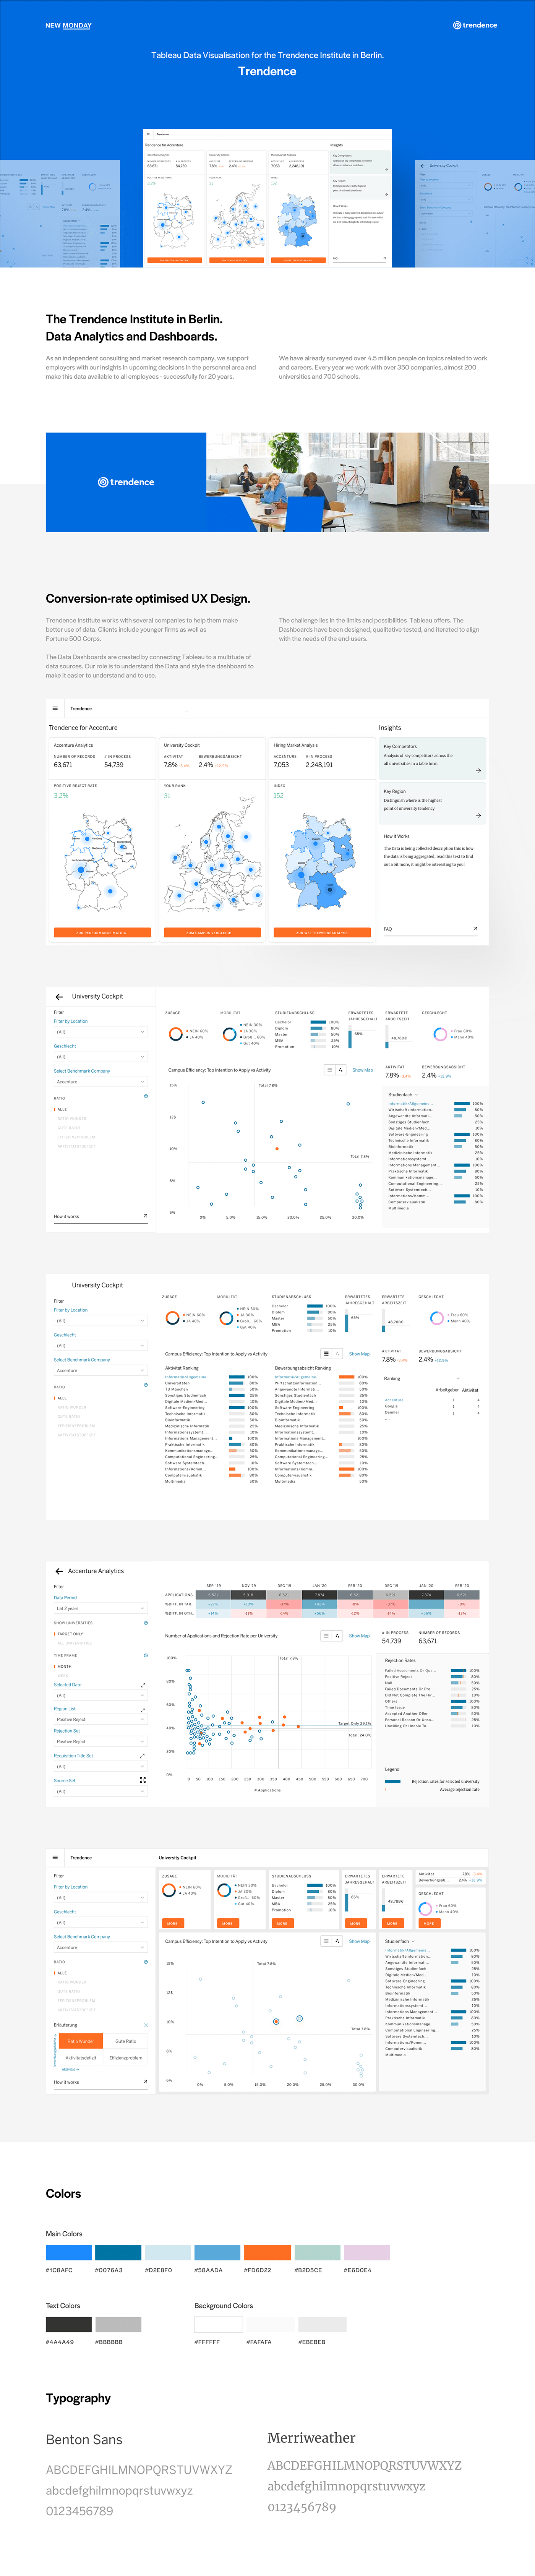 clean dashboard design tableau tableau design system UI ui ux ux Web data visualisation